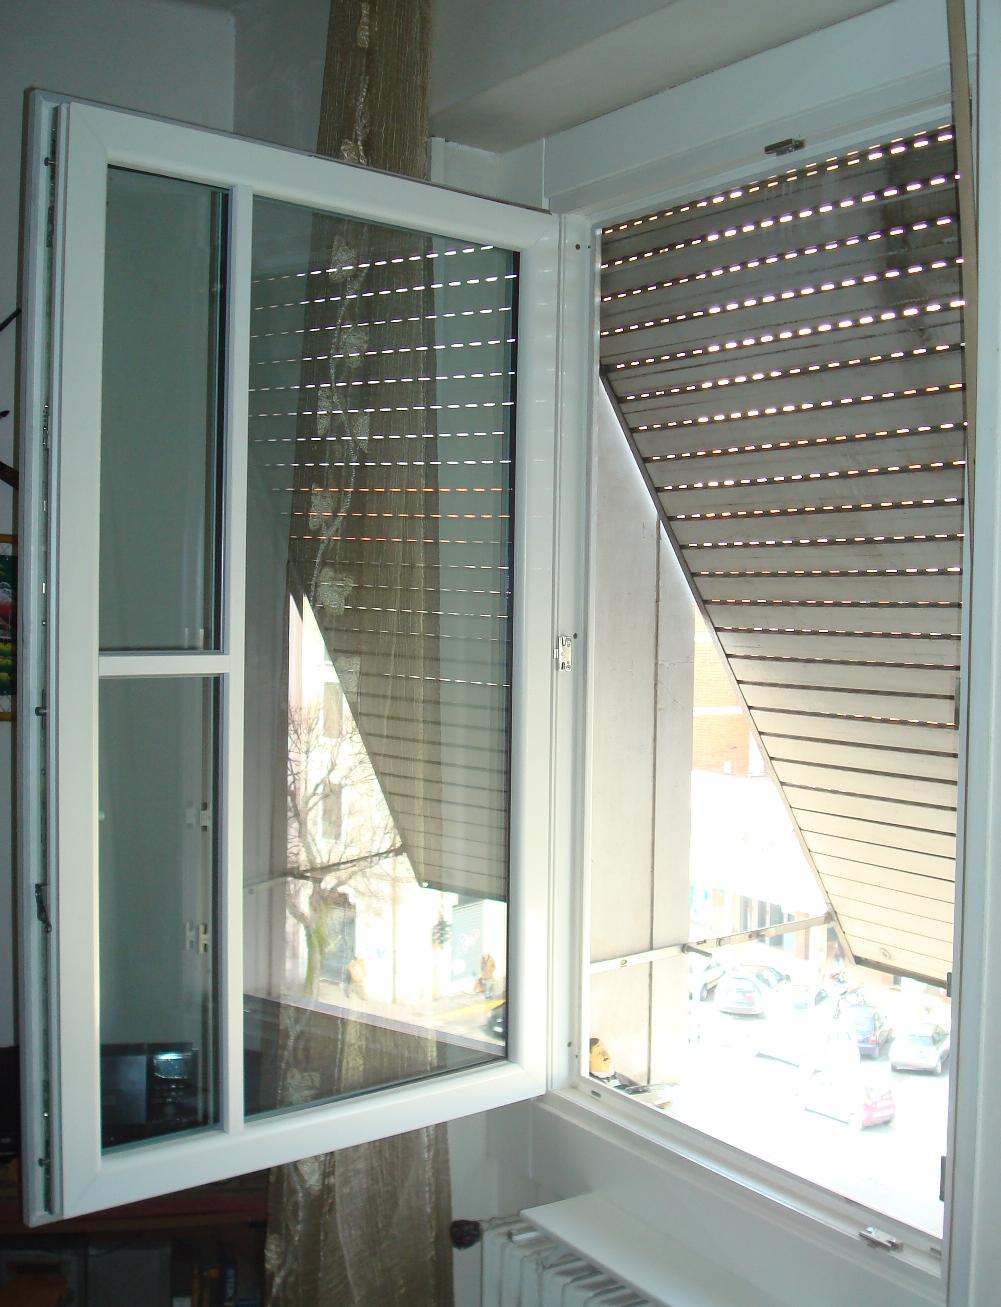 Preventivi per serramenti e infissi ultime settimane - Detrazione 65 finestre ...